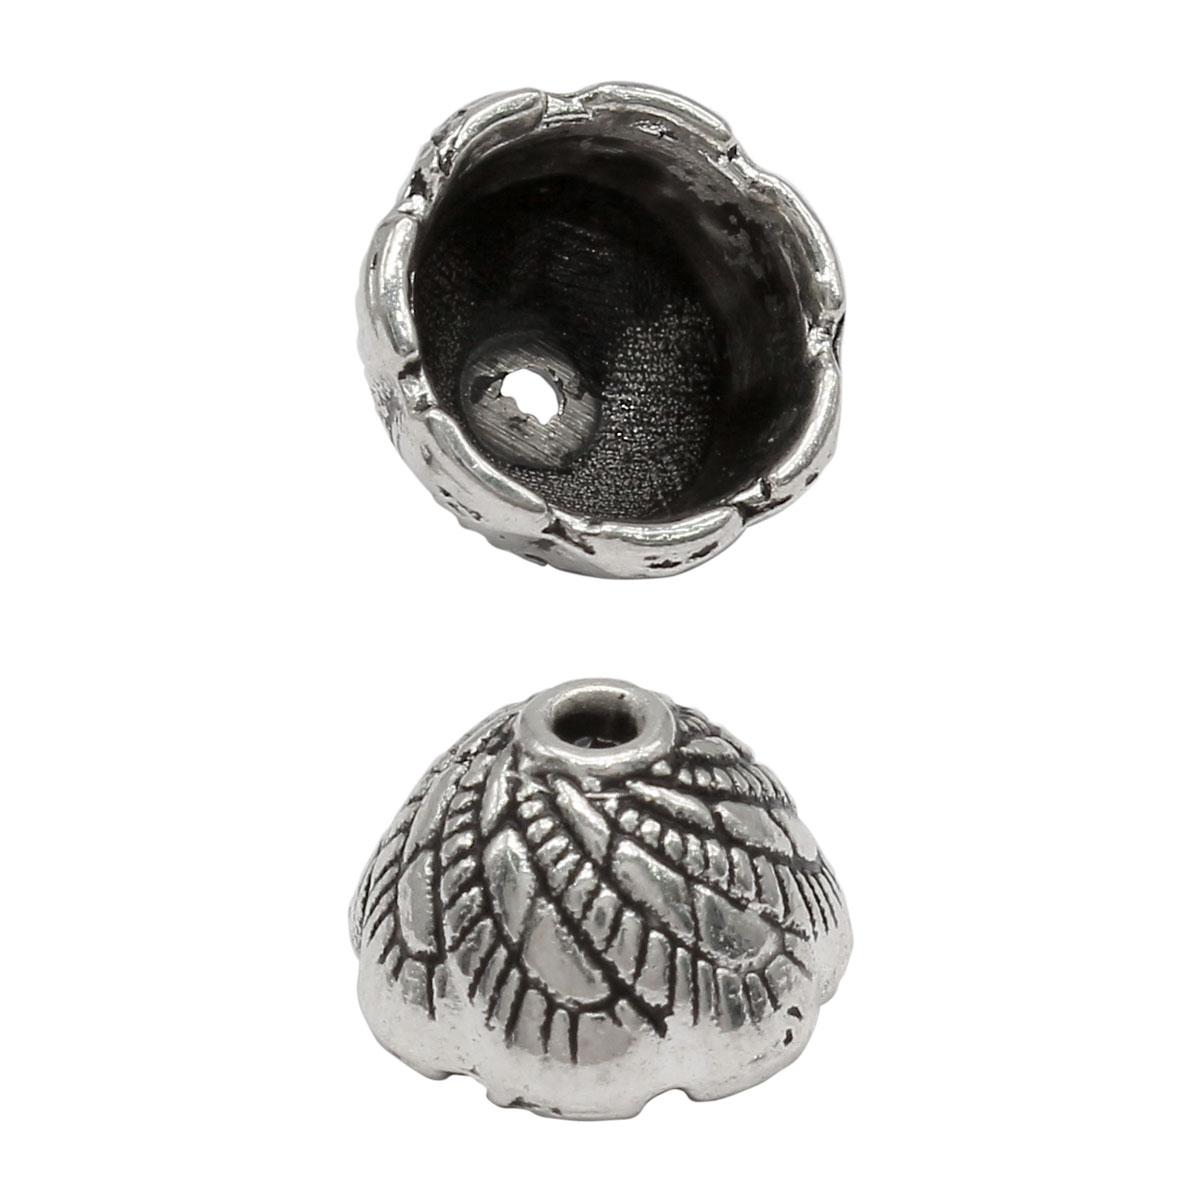 Шапочка для бусин 4AR277, 10,5мм, серебро, 10шт/упак, Астра